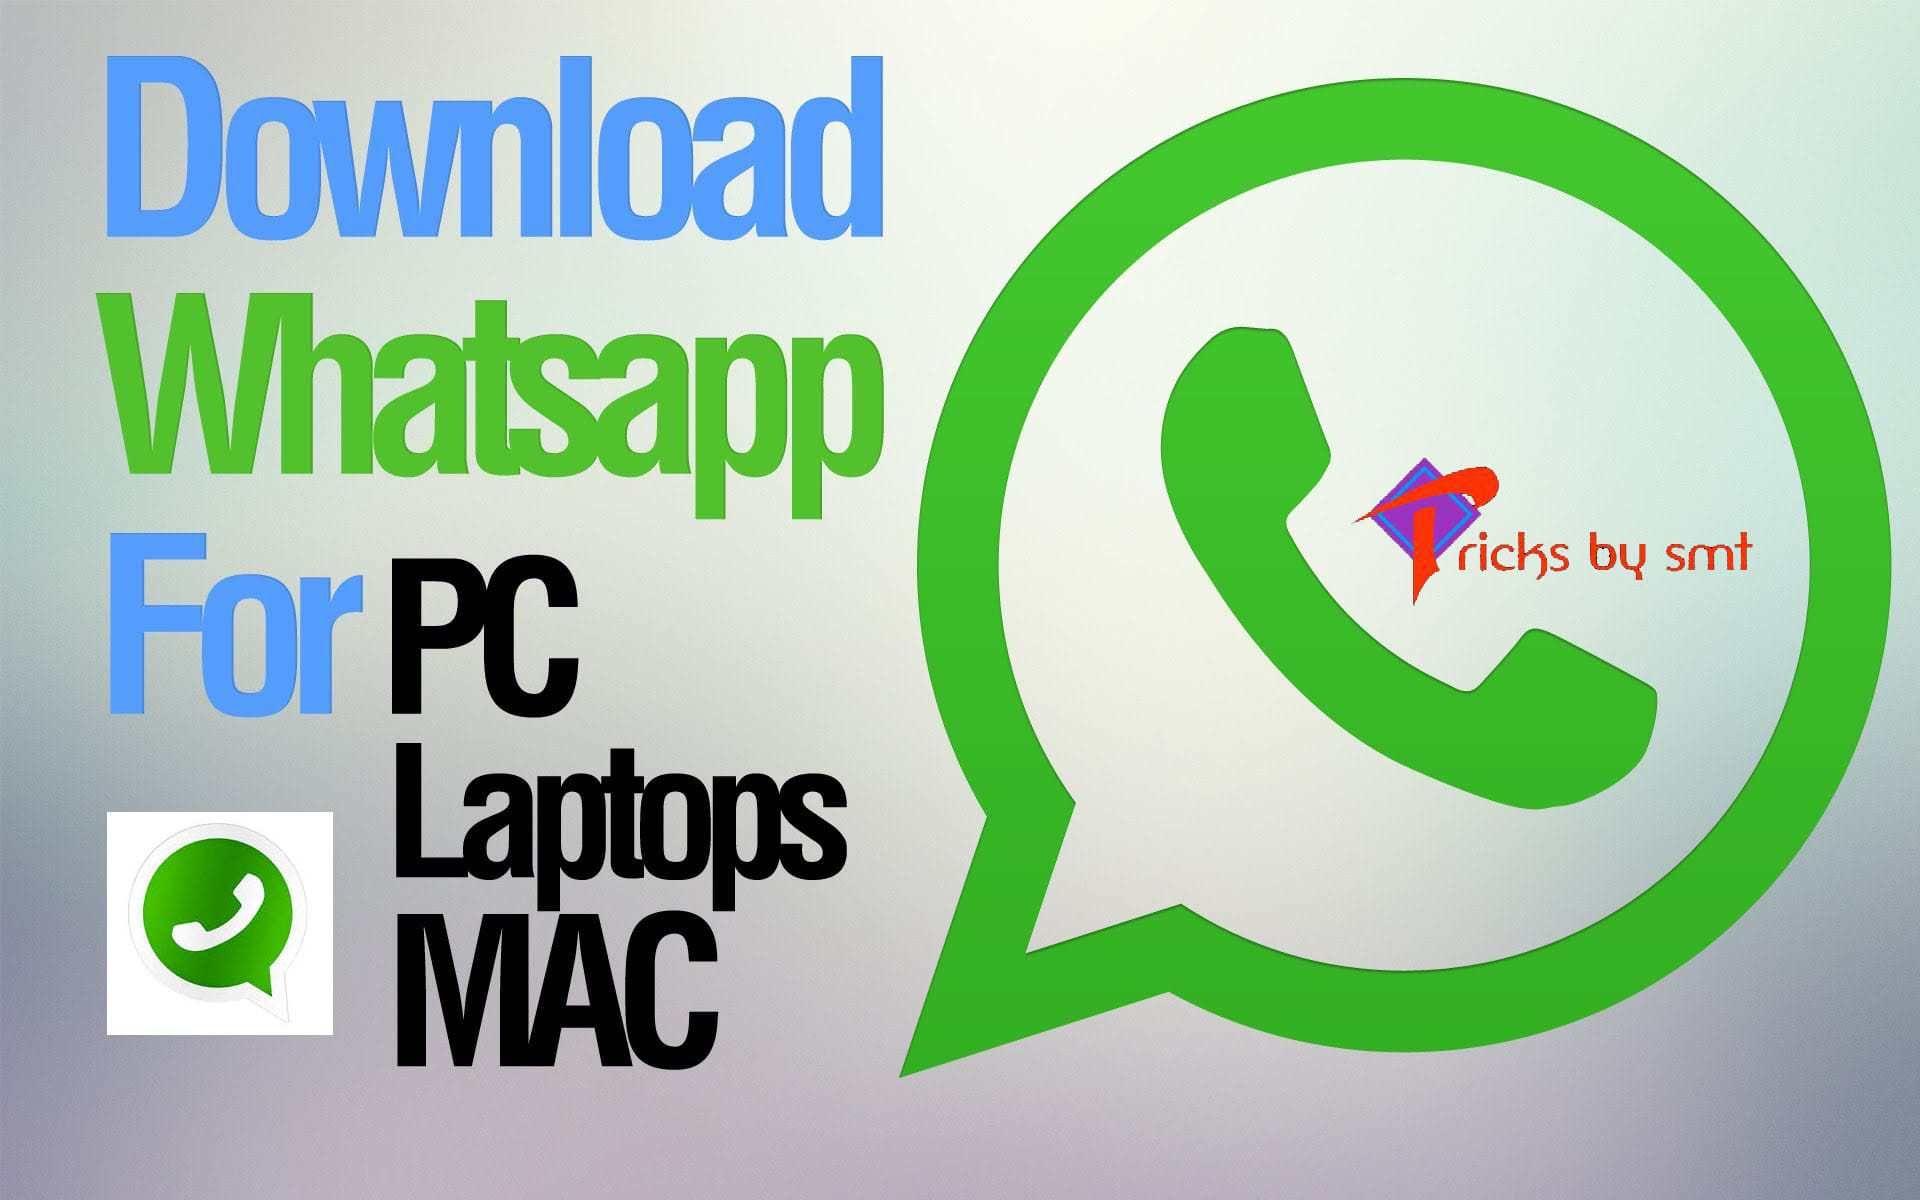 Download WhatsApp Desktop Messenger App on Computer/Laptop